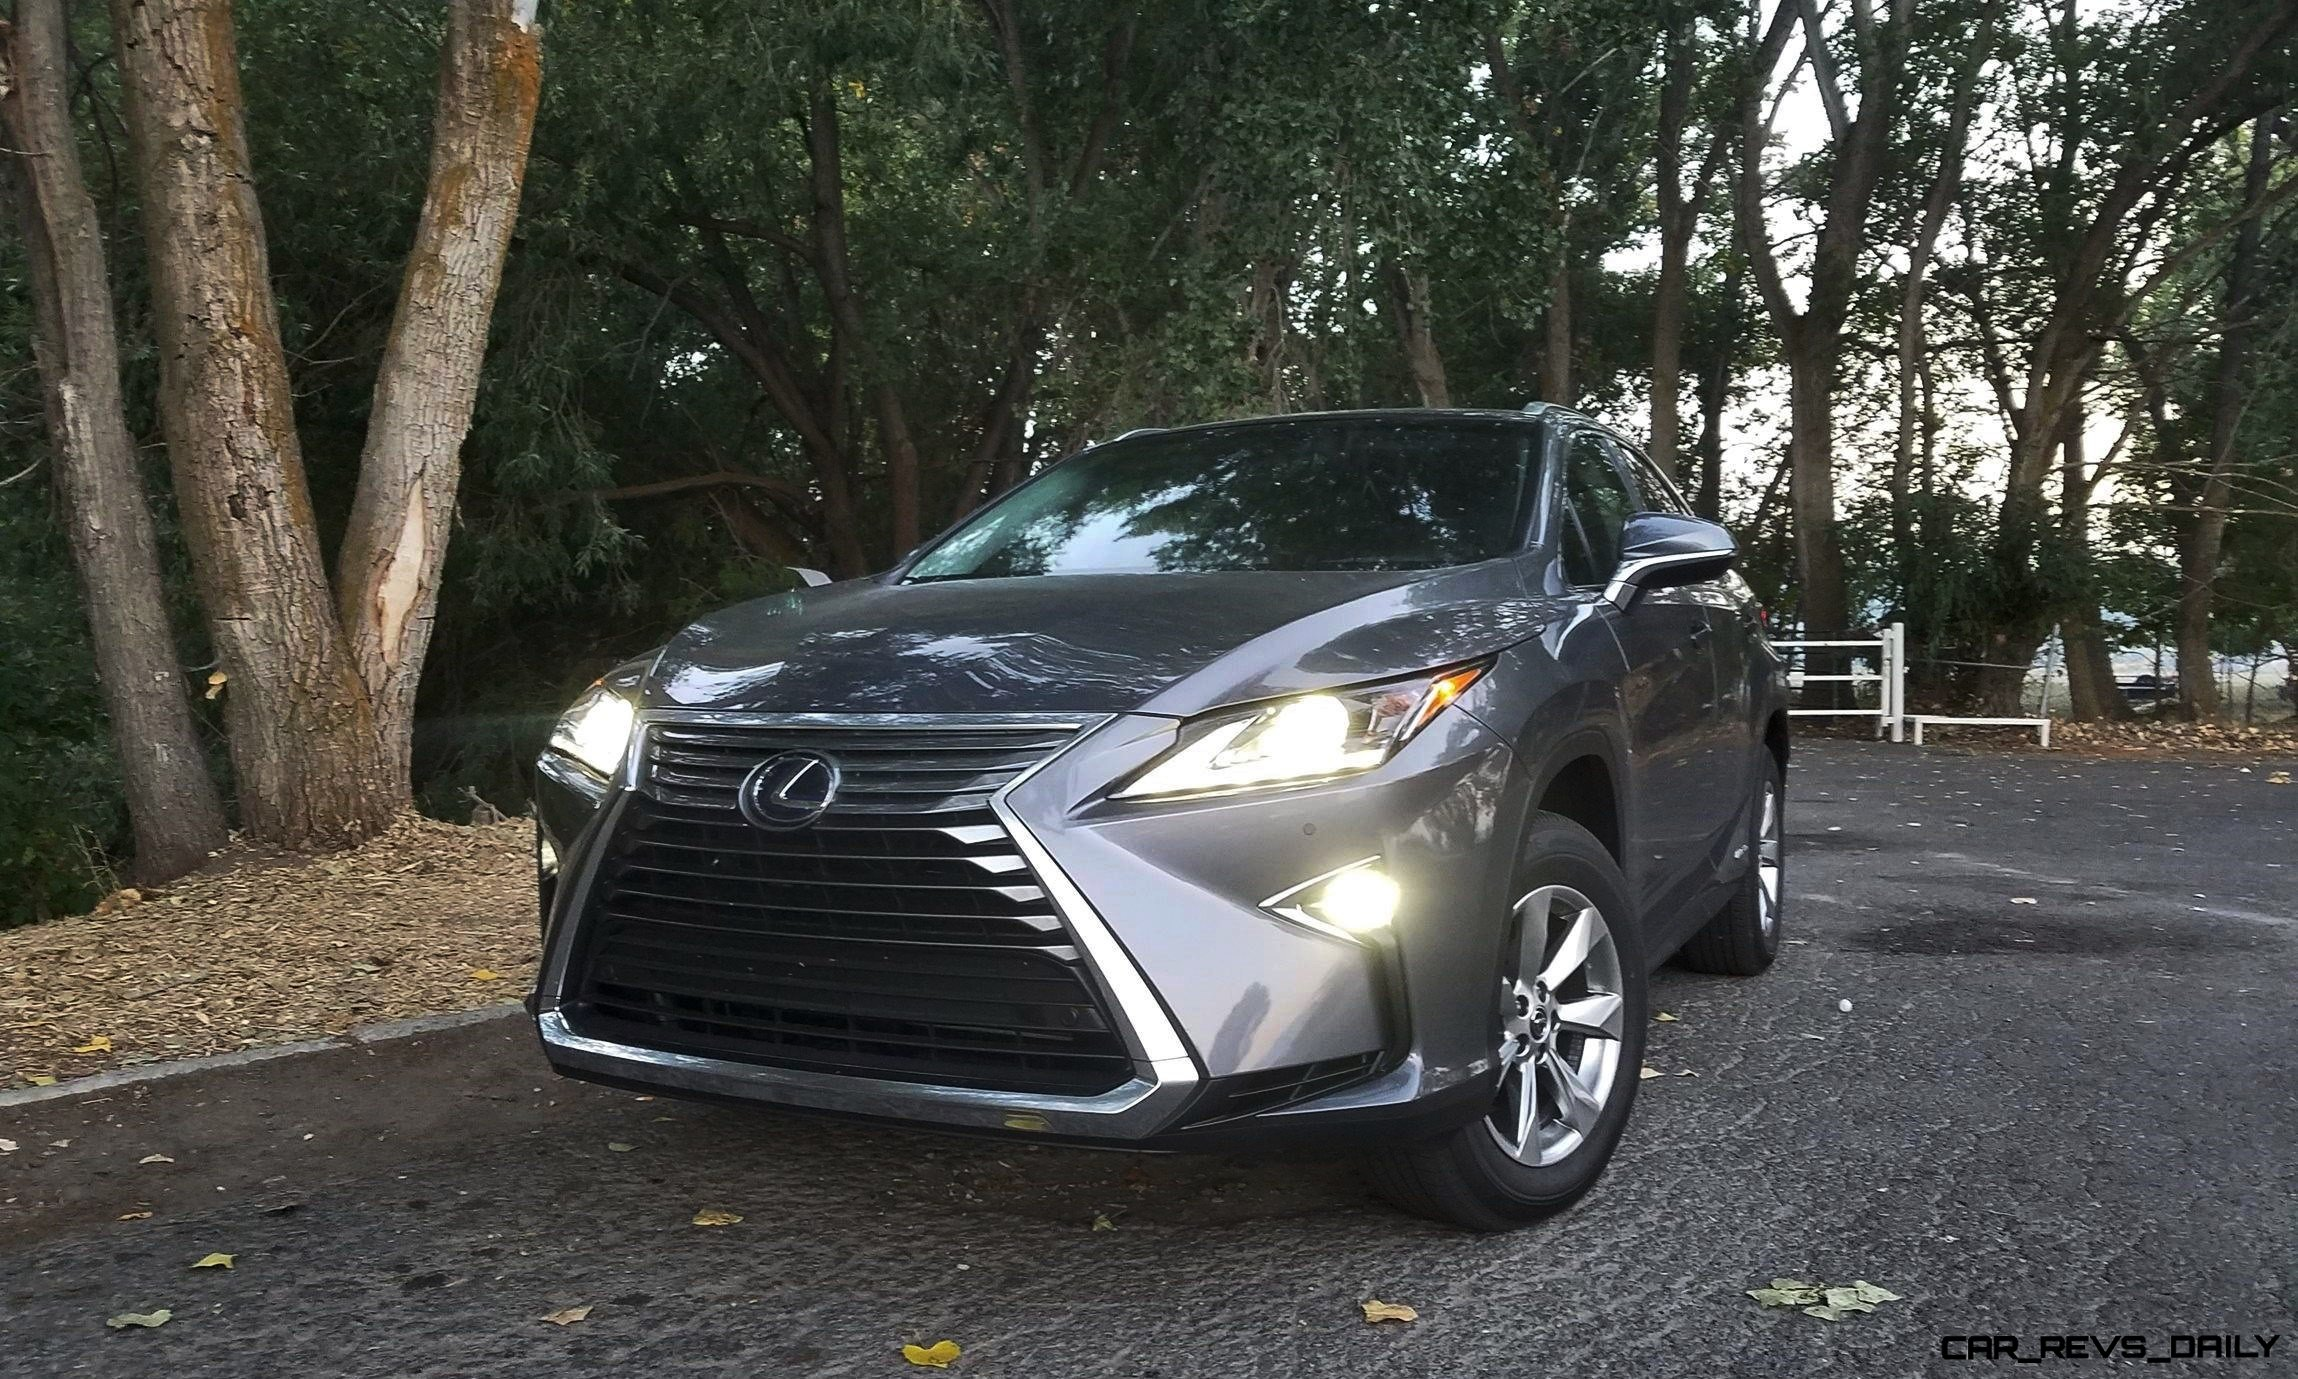 2018 lexus rx450h - road test review -matt barnes » car shopping